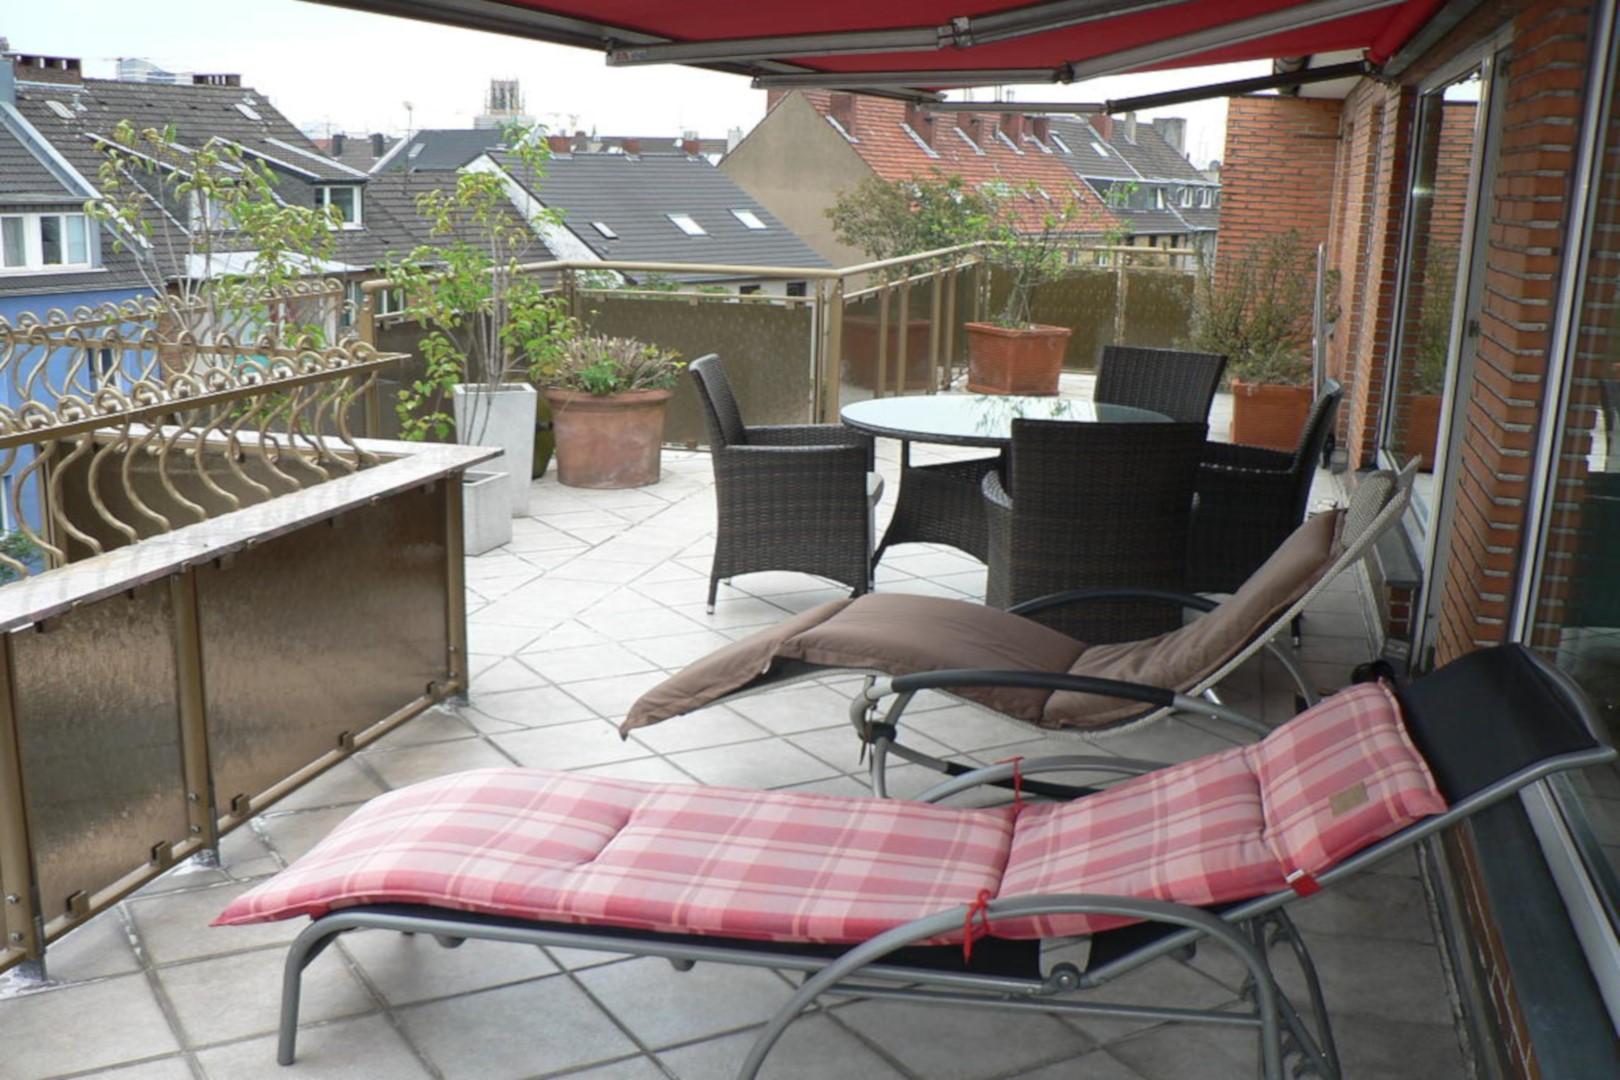 Immobilie Nr.326 | Ulmenstraße 1 , 40476 Düsseldorf